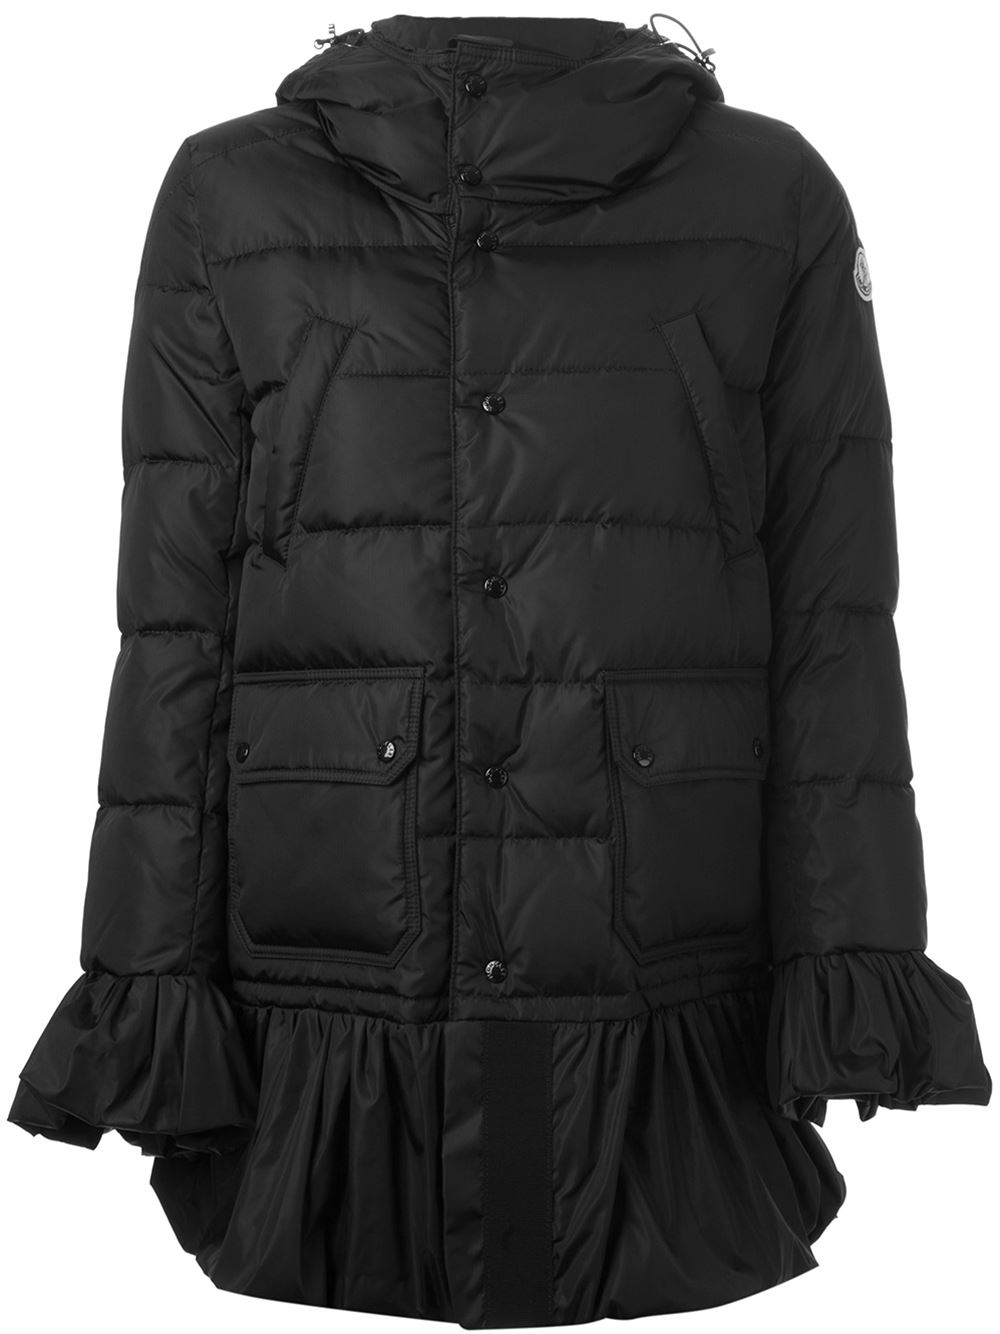 Moncler &39serre&39 Padded Coat in Black | Lyst